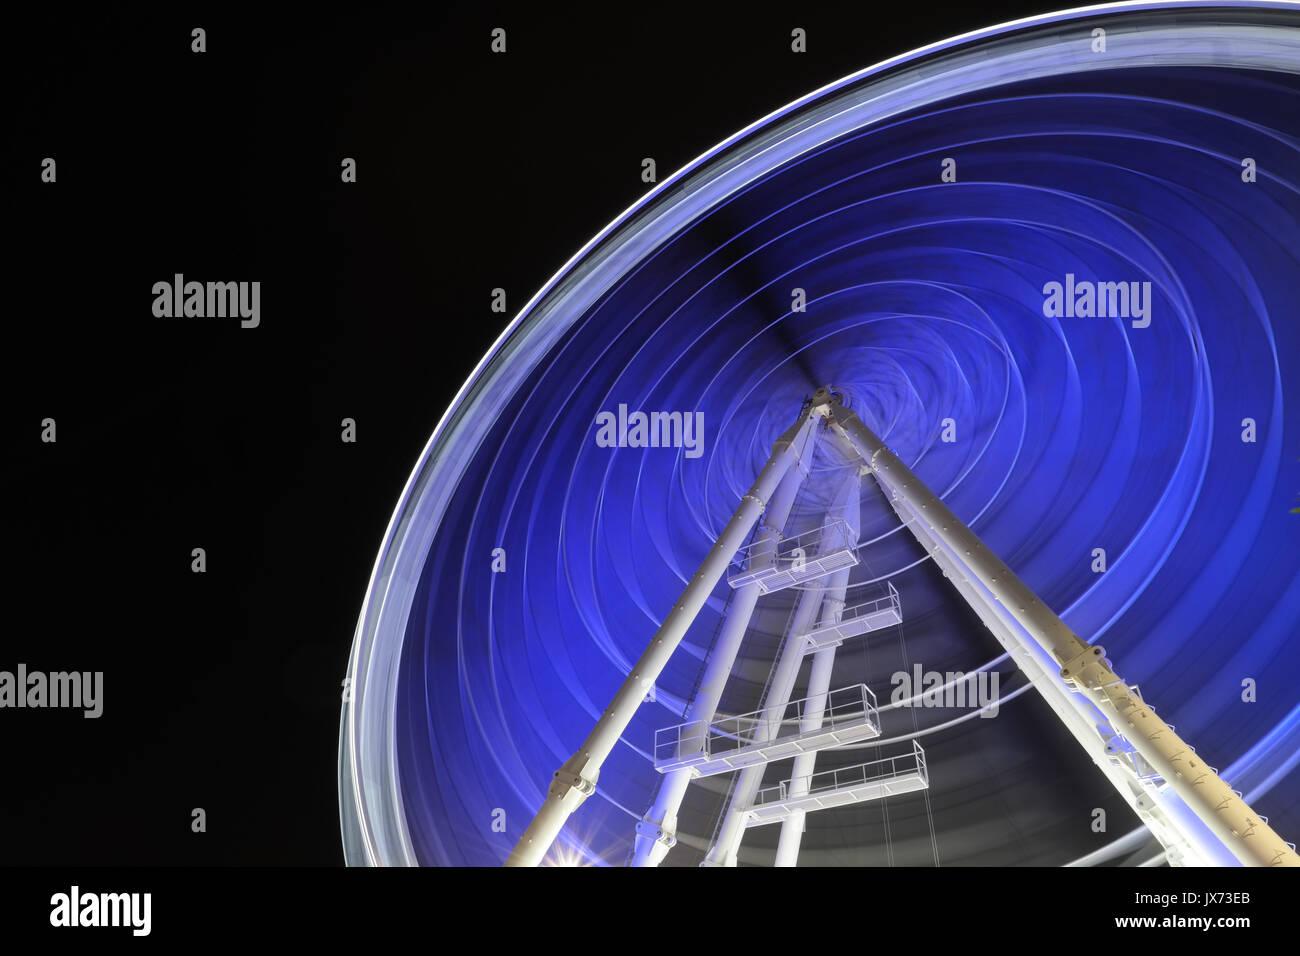 Marina Eye ferris wheel in Abu Dhabi - Stock Image